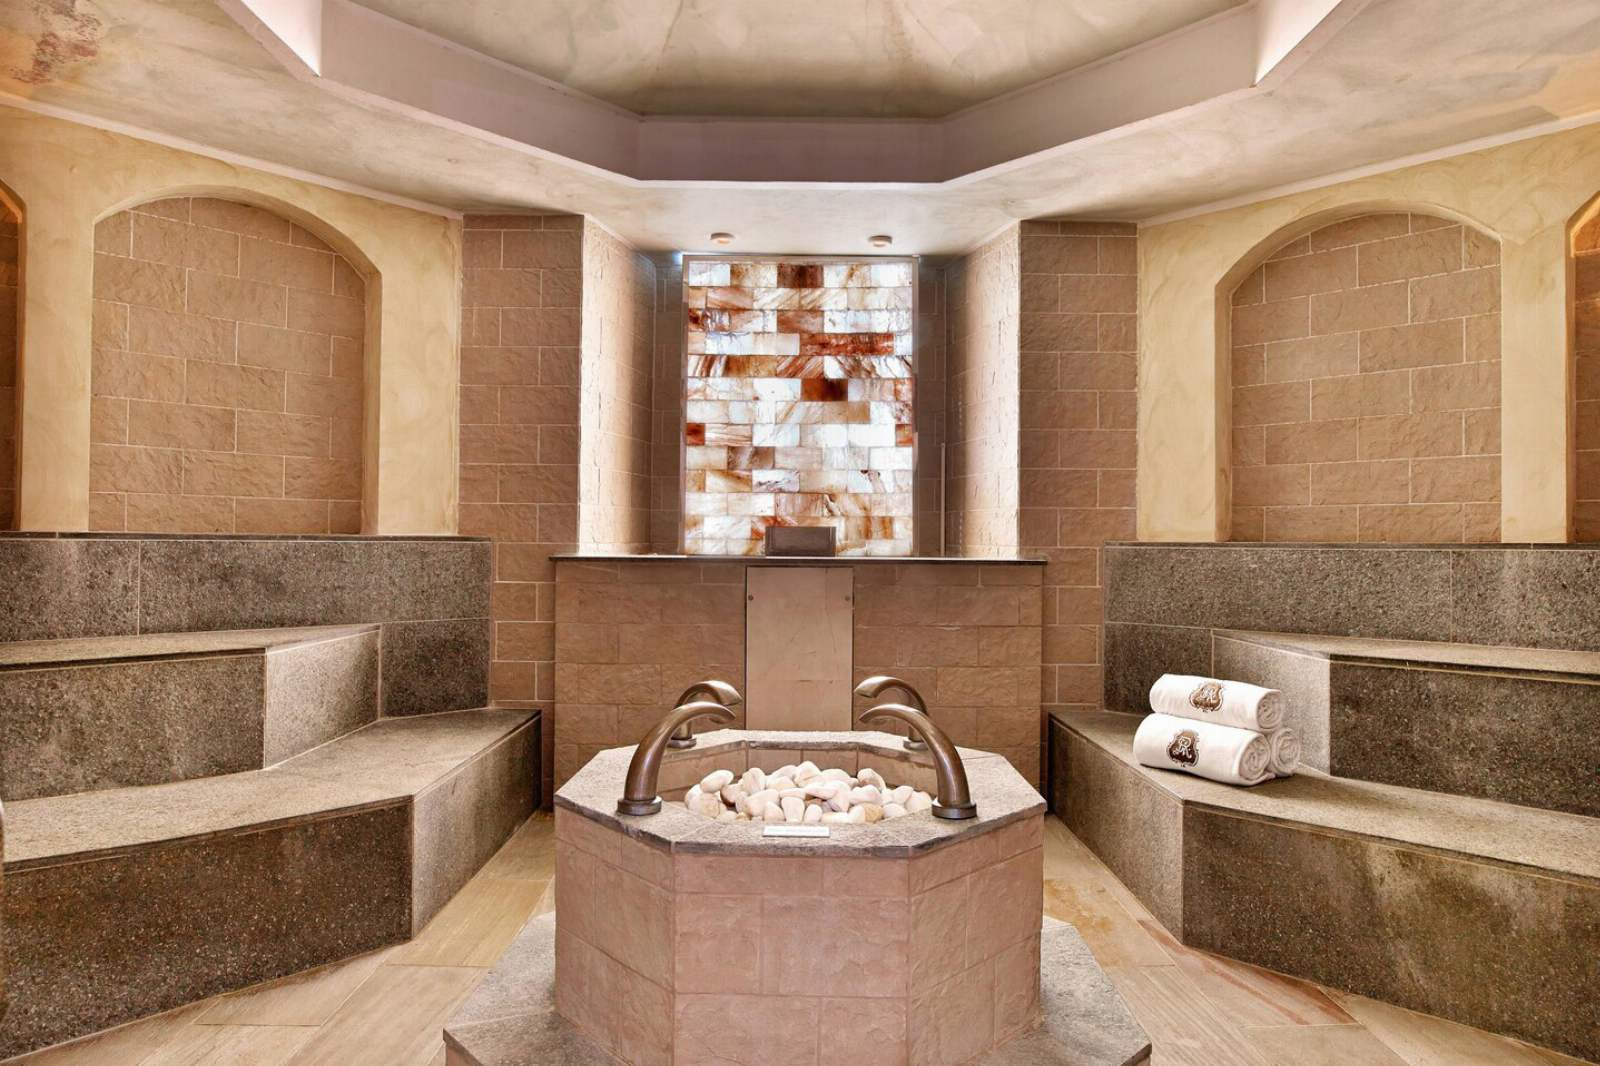 St. Regis Mardavall Resort - Arabella Spa Sauna